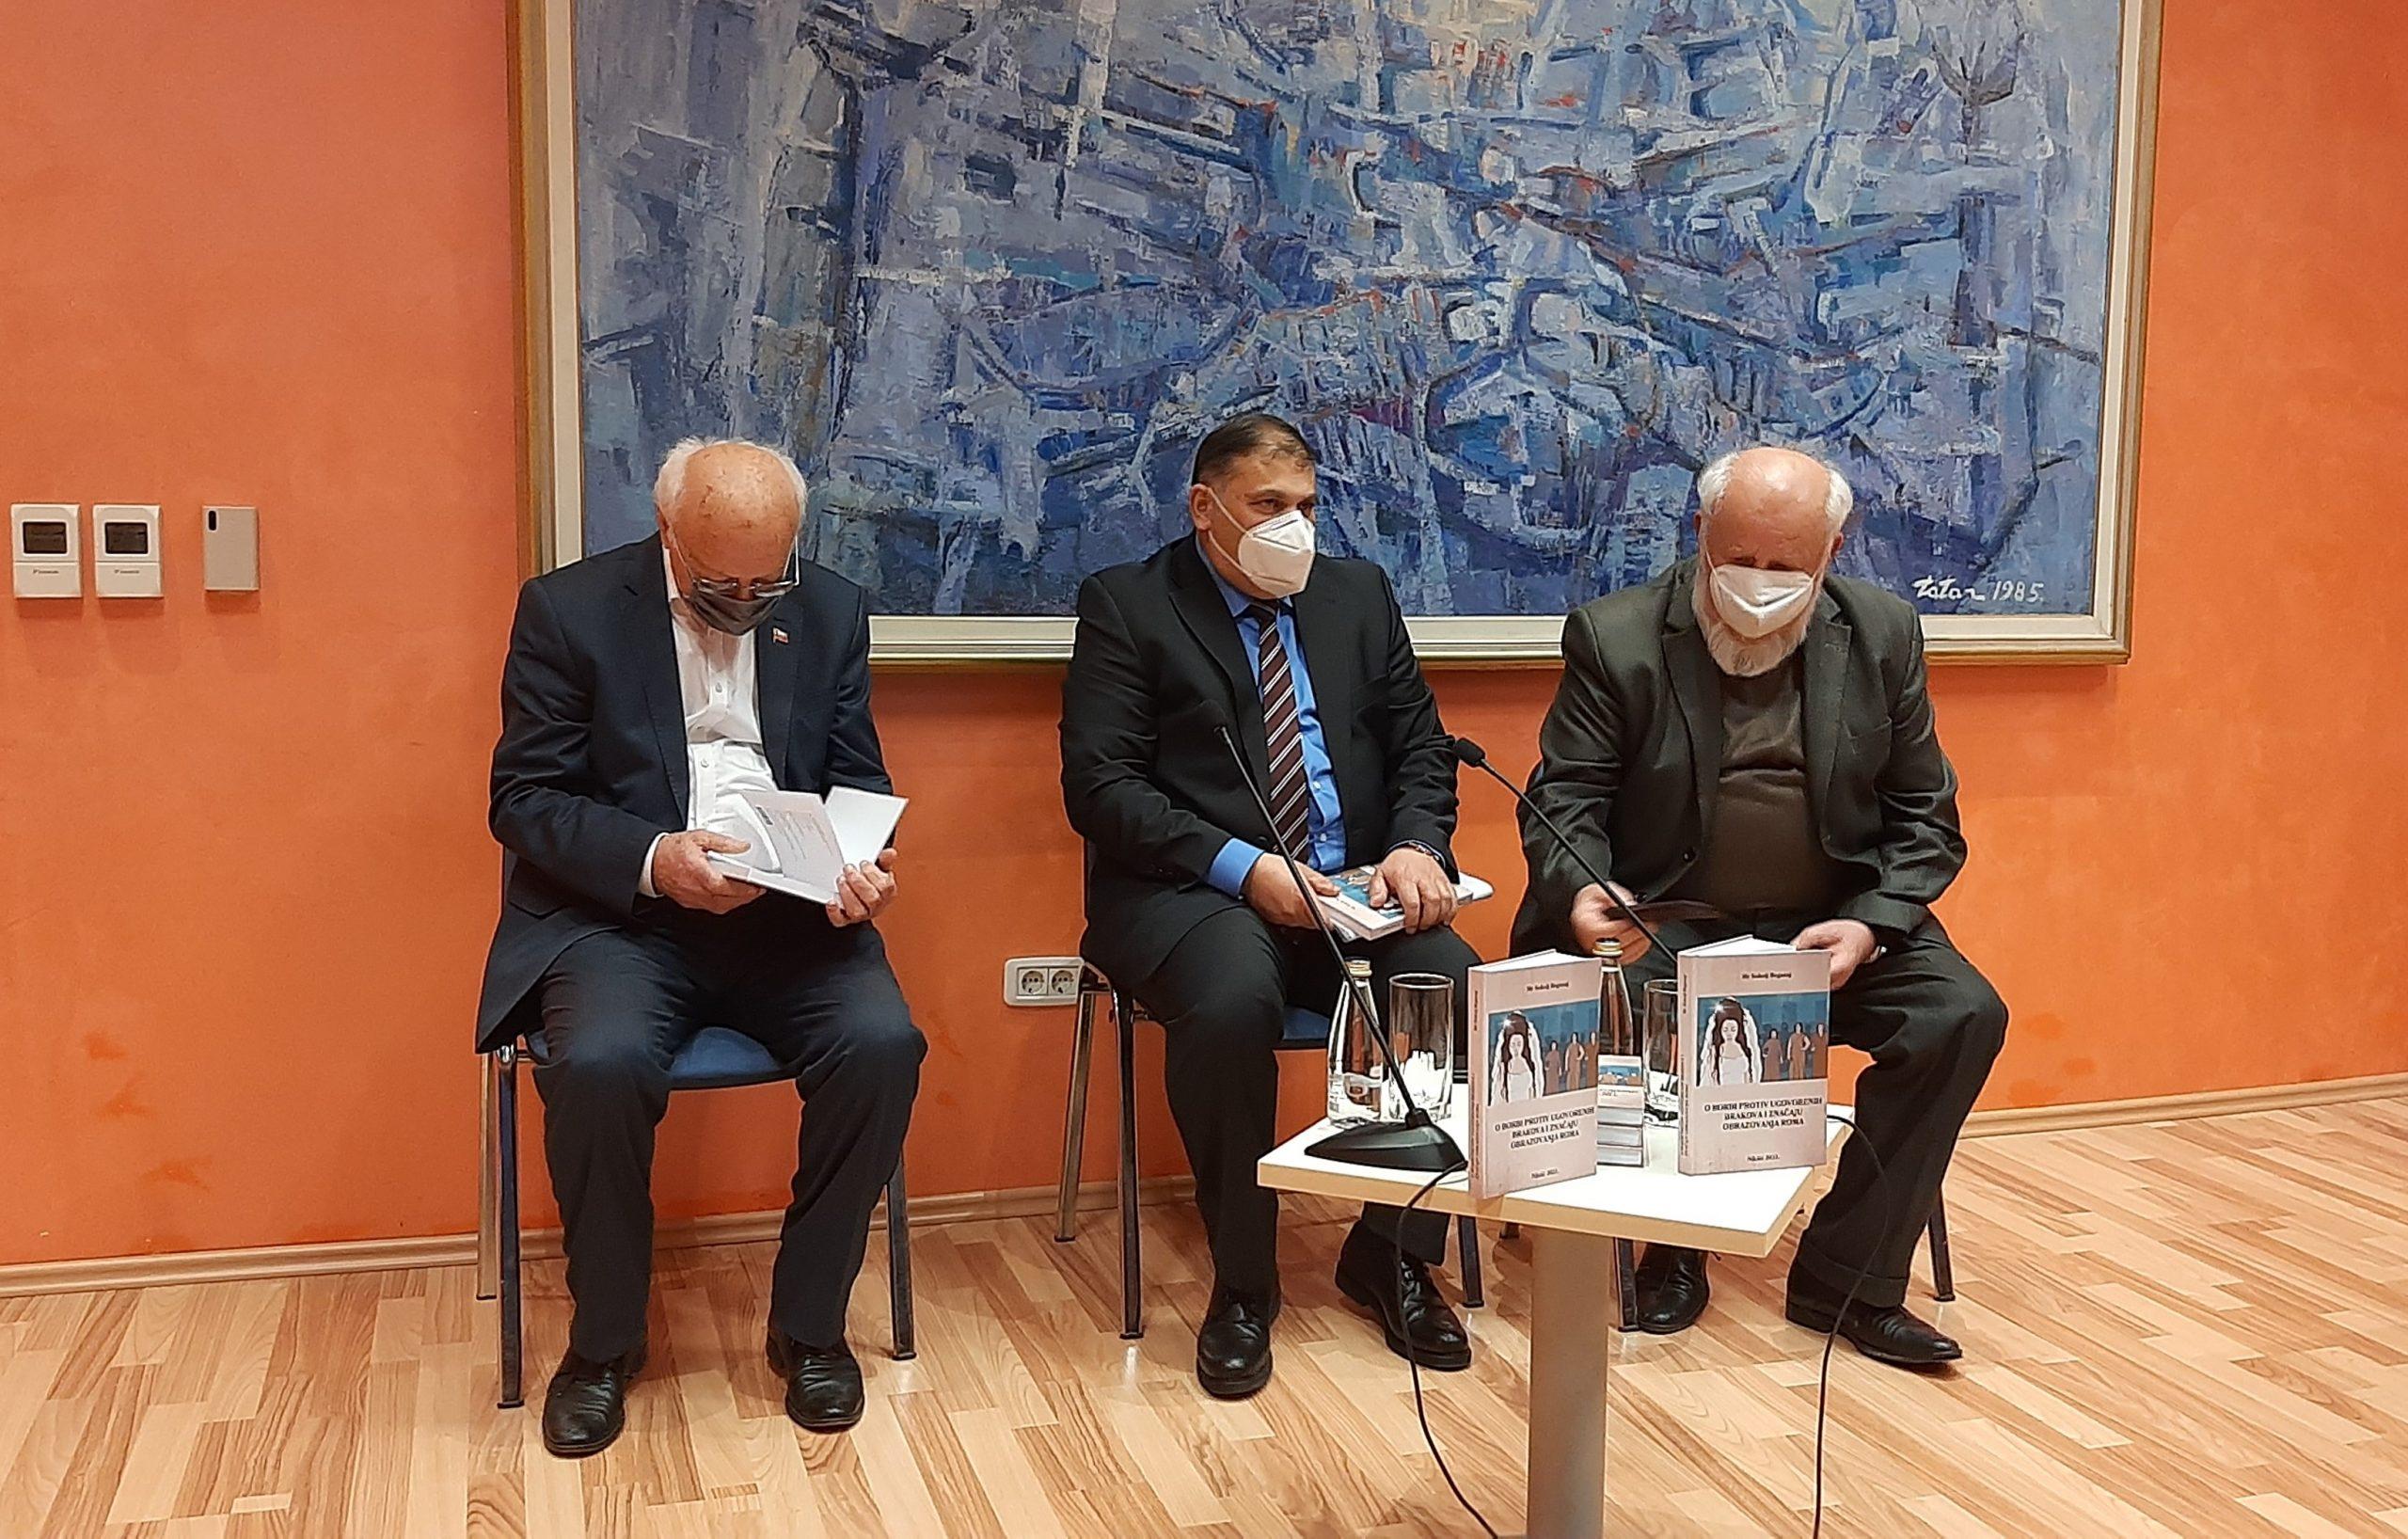 Zuvdija Hodžić-akademik, mr Sokolj Beganaj i Dragan Mitov Đurović-novinar Fotografija: Nardi Ahmetović()